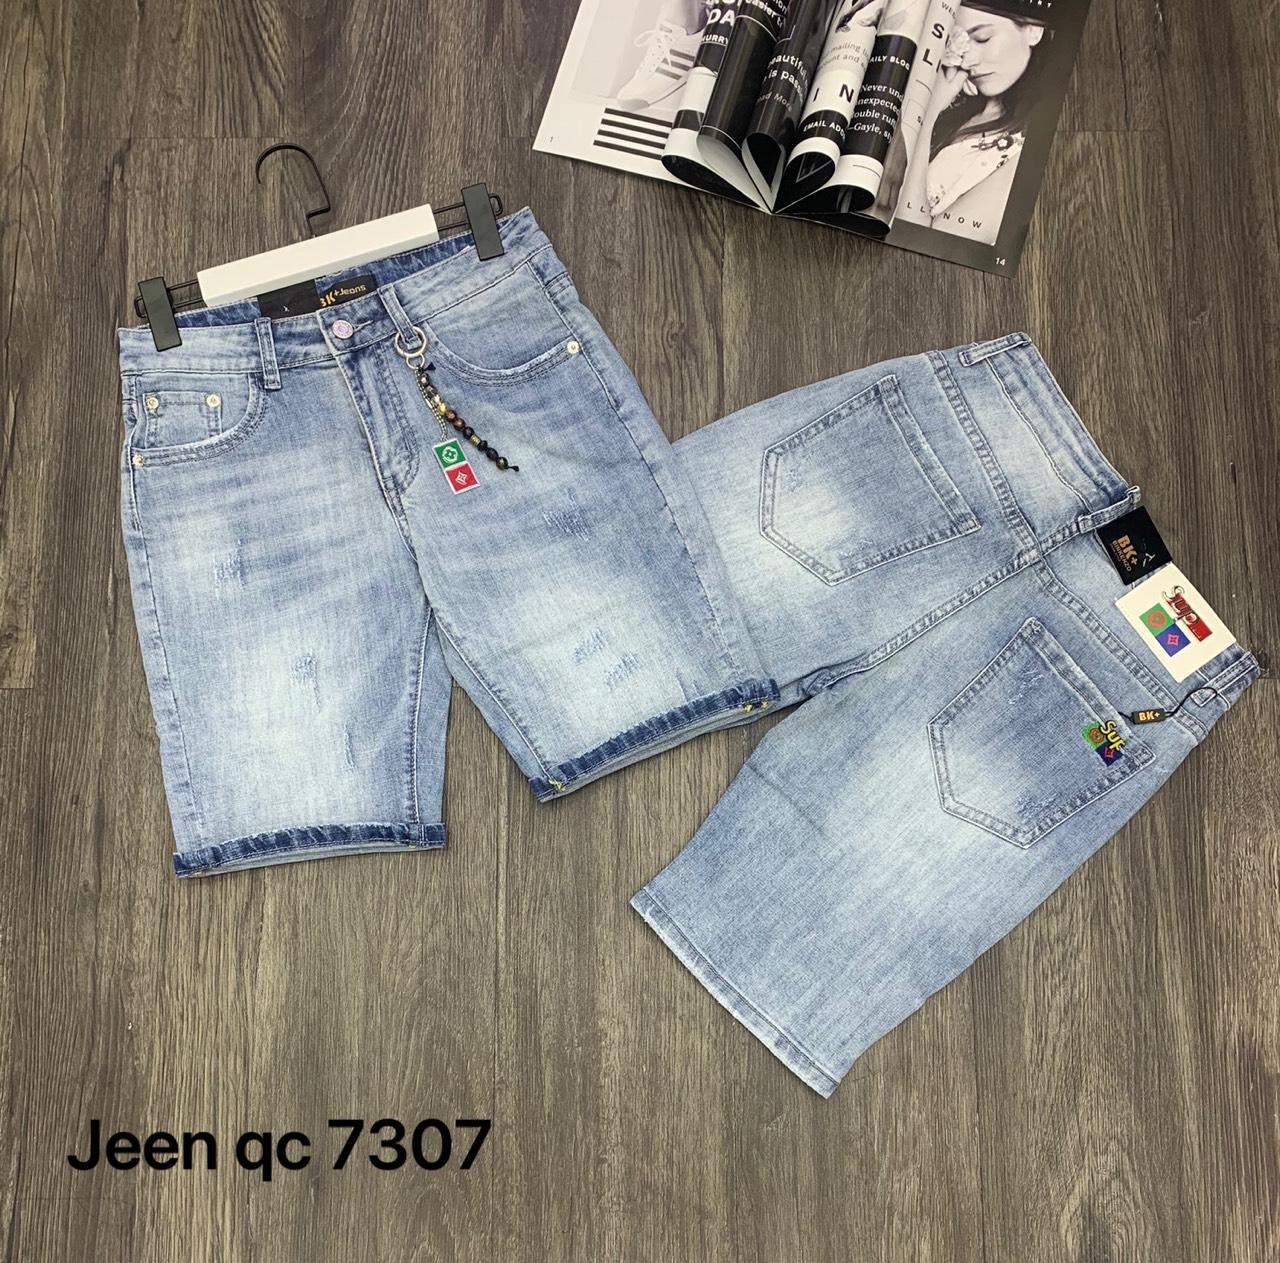 quần sót jeans nam, quan sot jeans nam